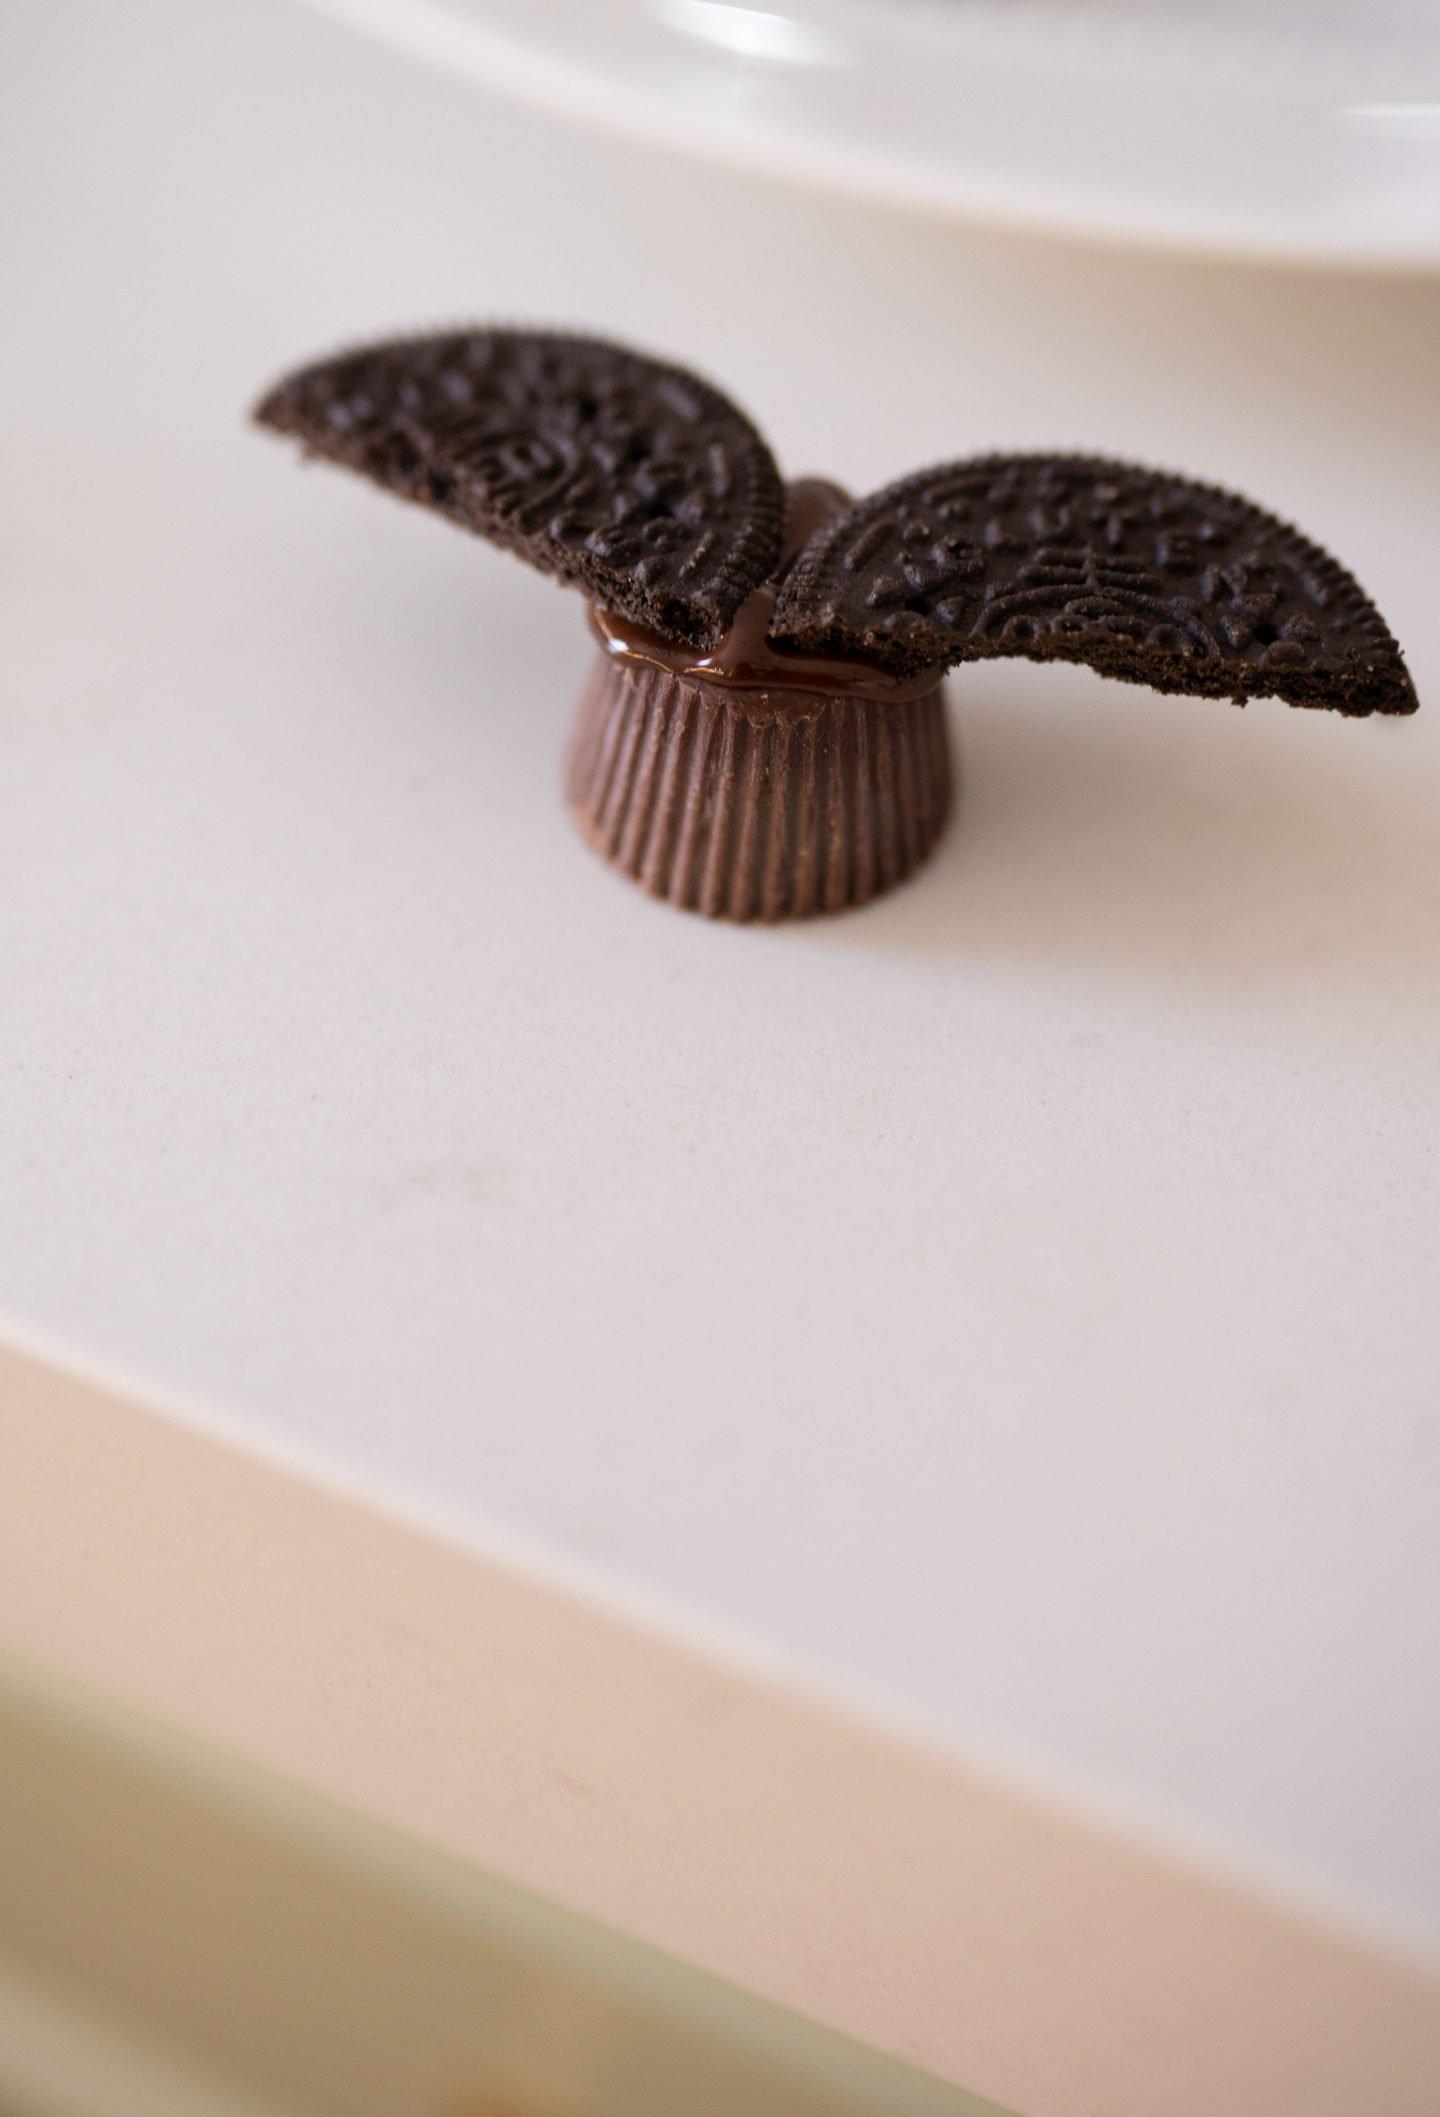 Chocolate Bat dessert